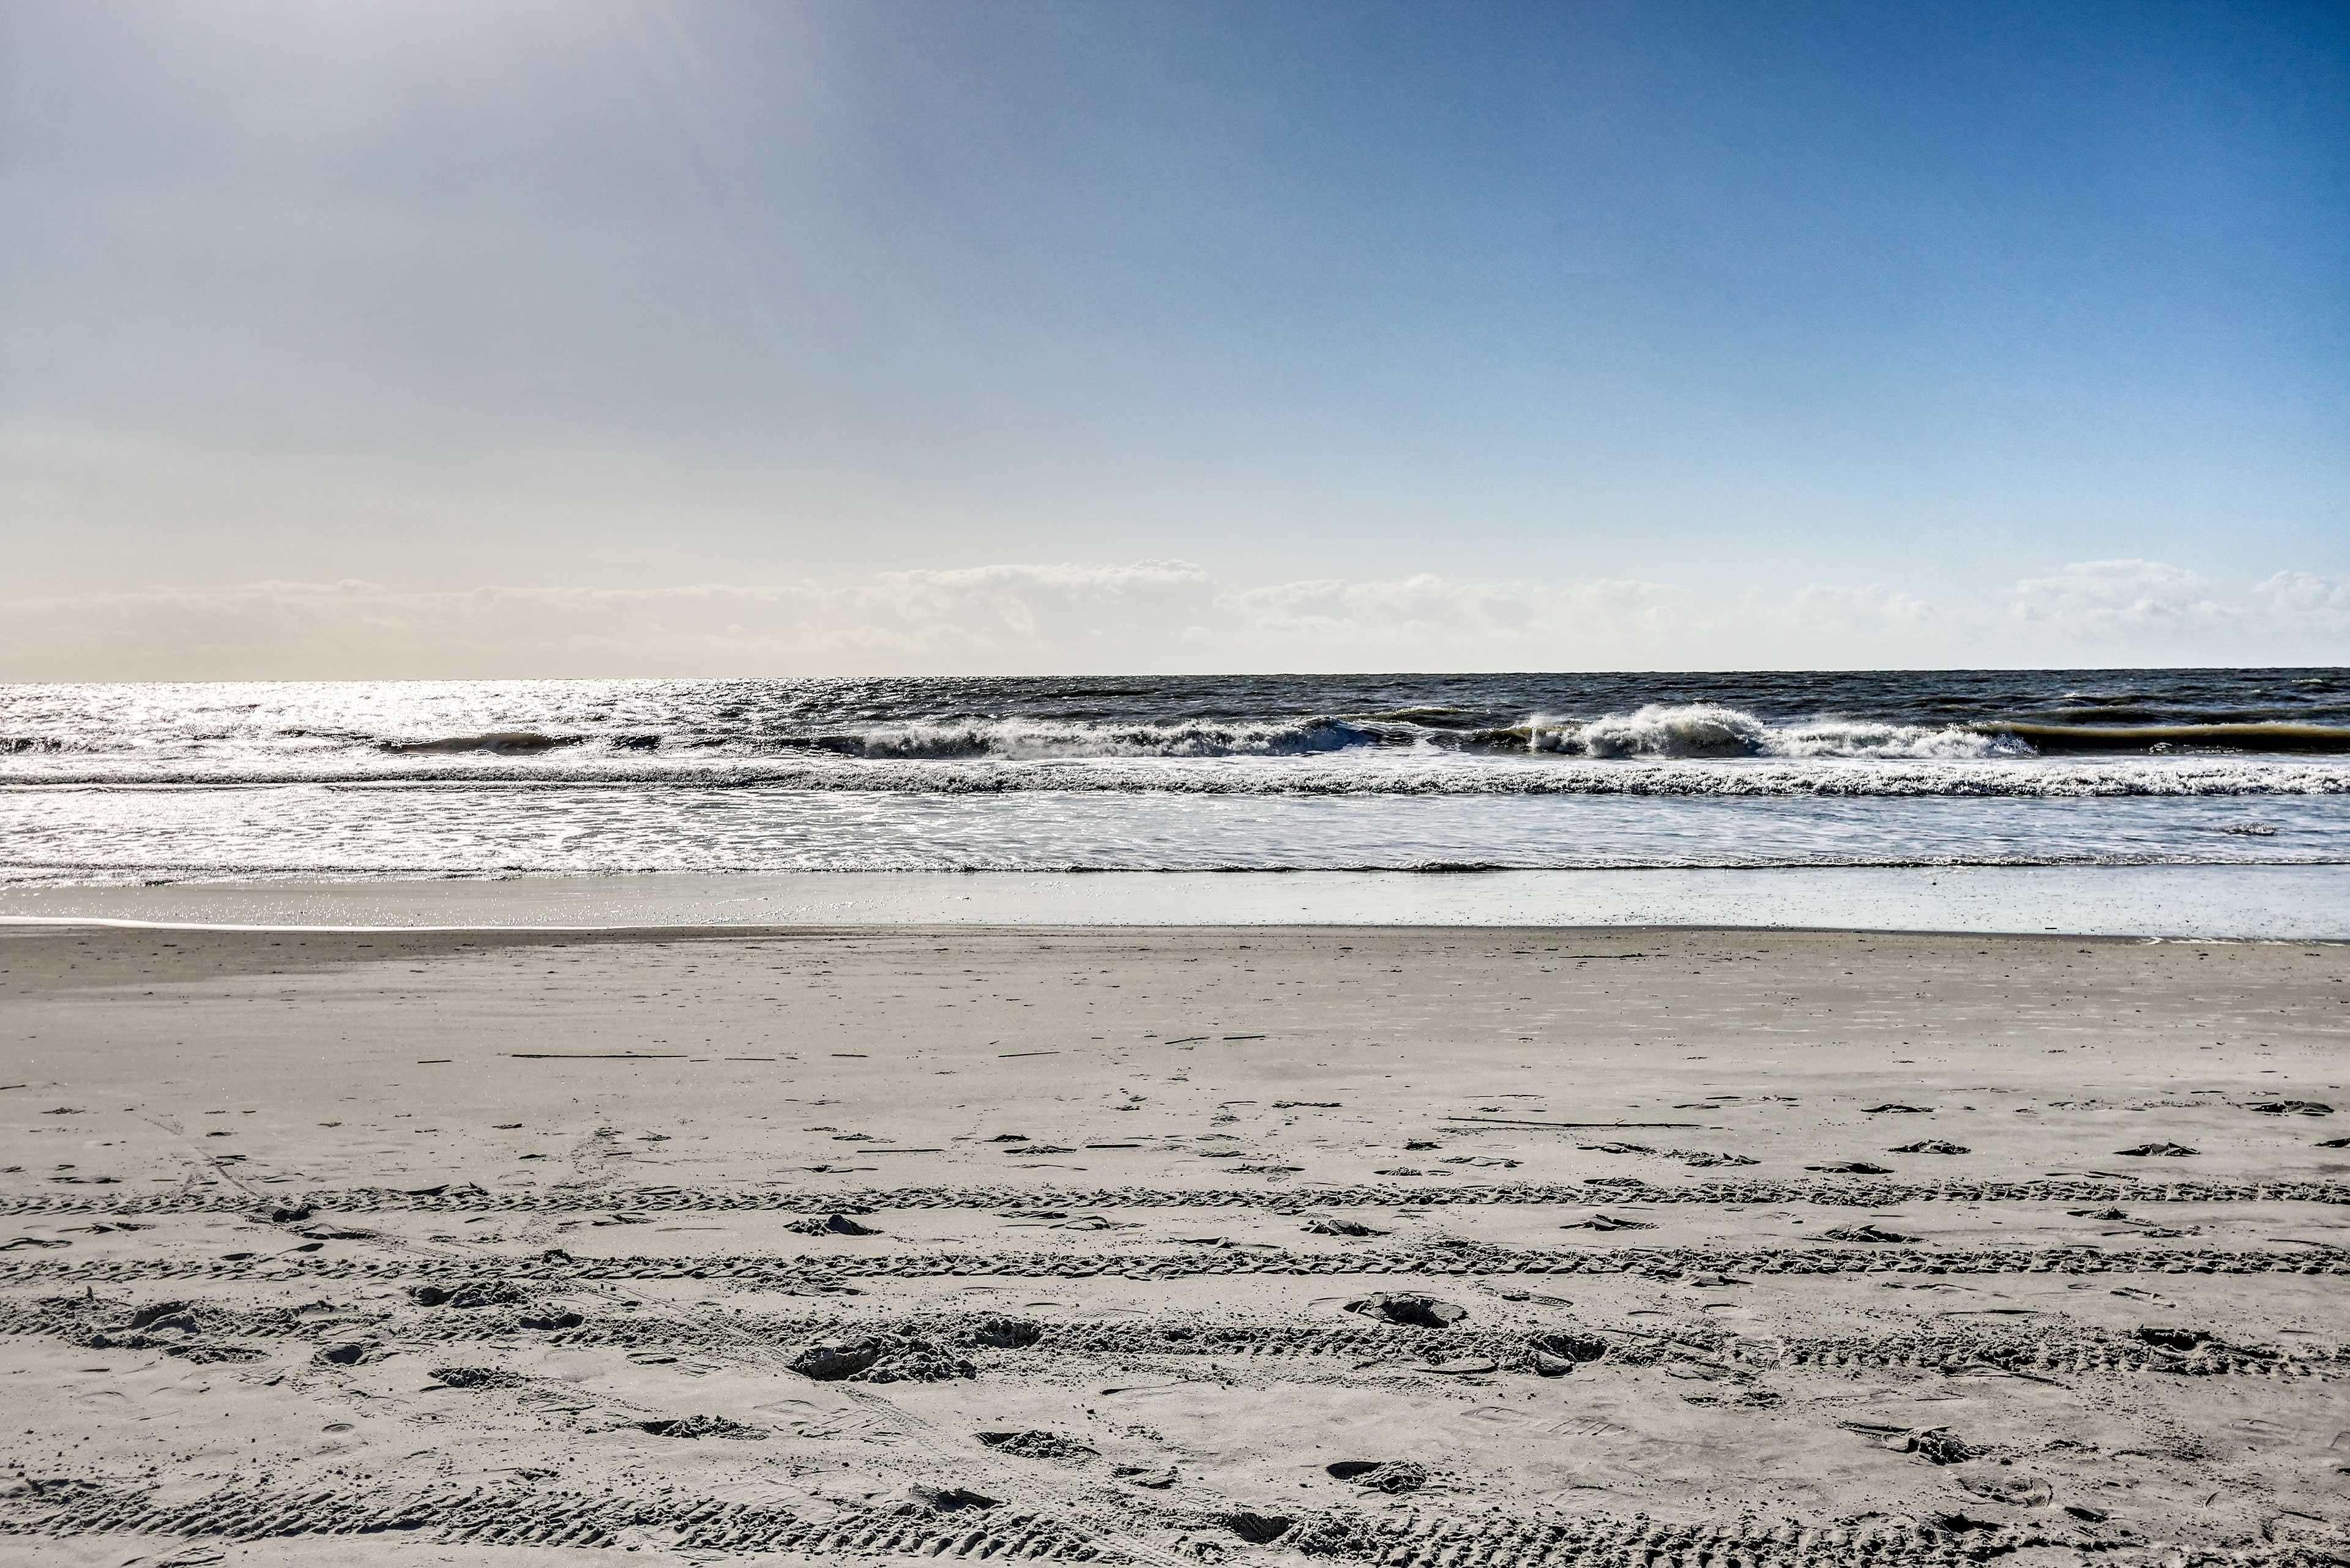 Spend your days splashing around the waves.